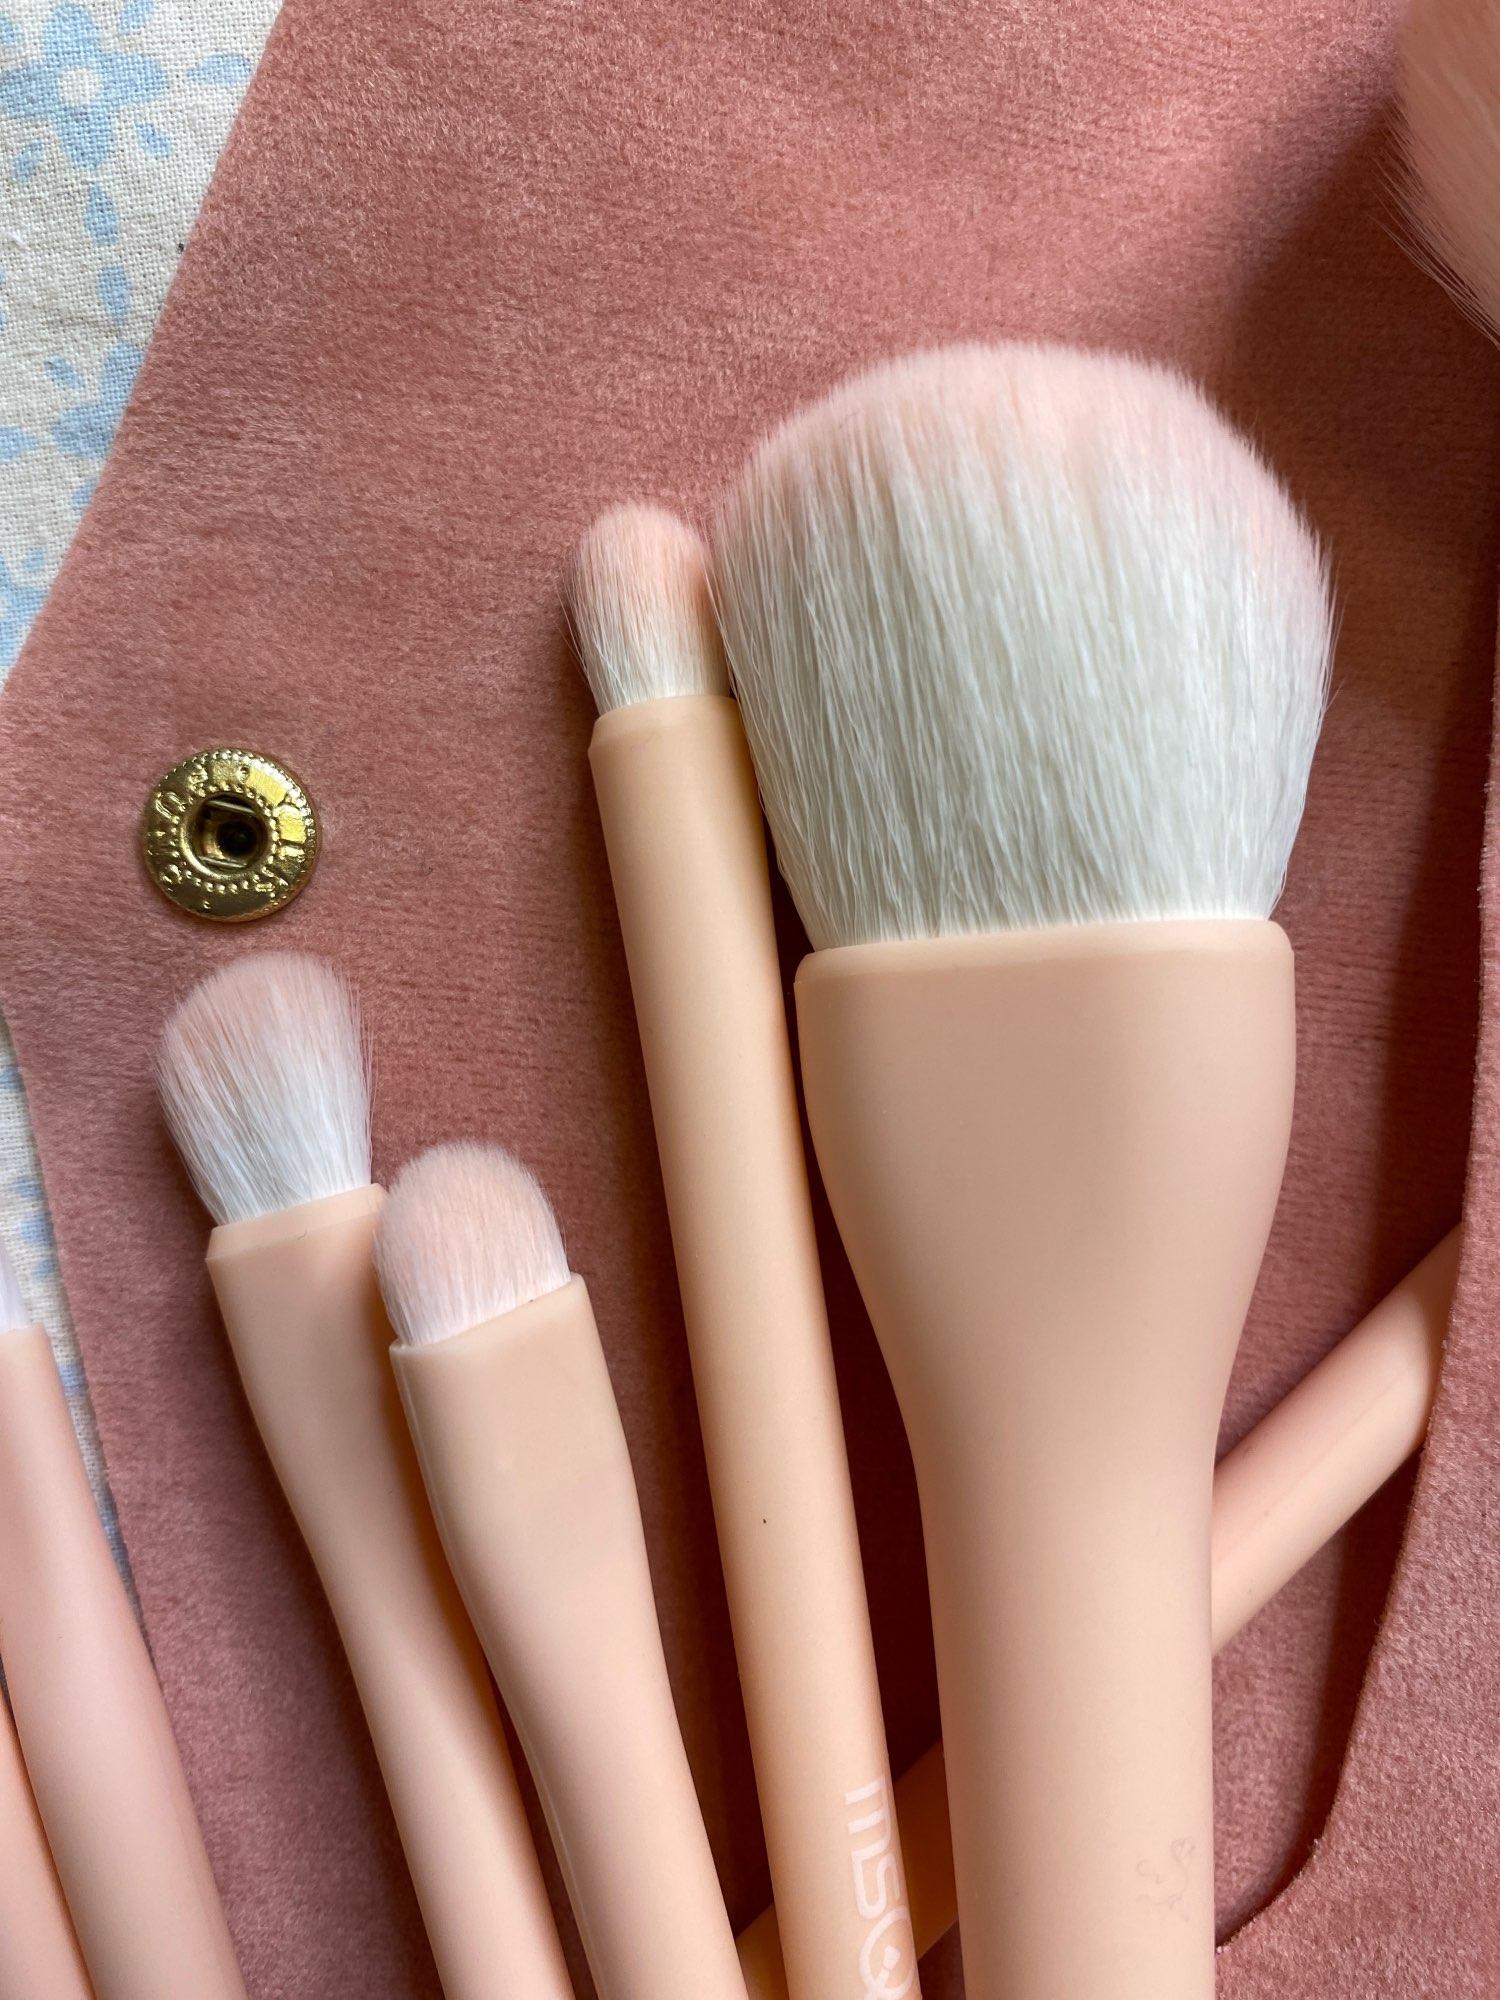 8PCS Makeup Brushes Sets Powder Foundation Blusher Eyeshadow Brush Candy Cosmetic Colorful Make Up NO MSQ LOGO With Bag reviews №3 223979